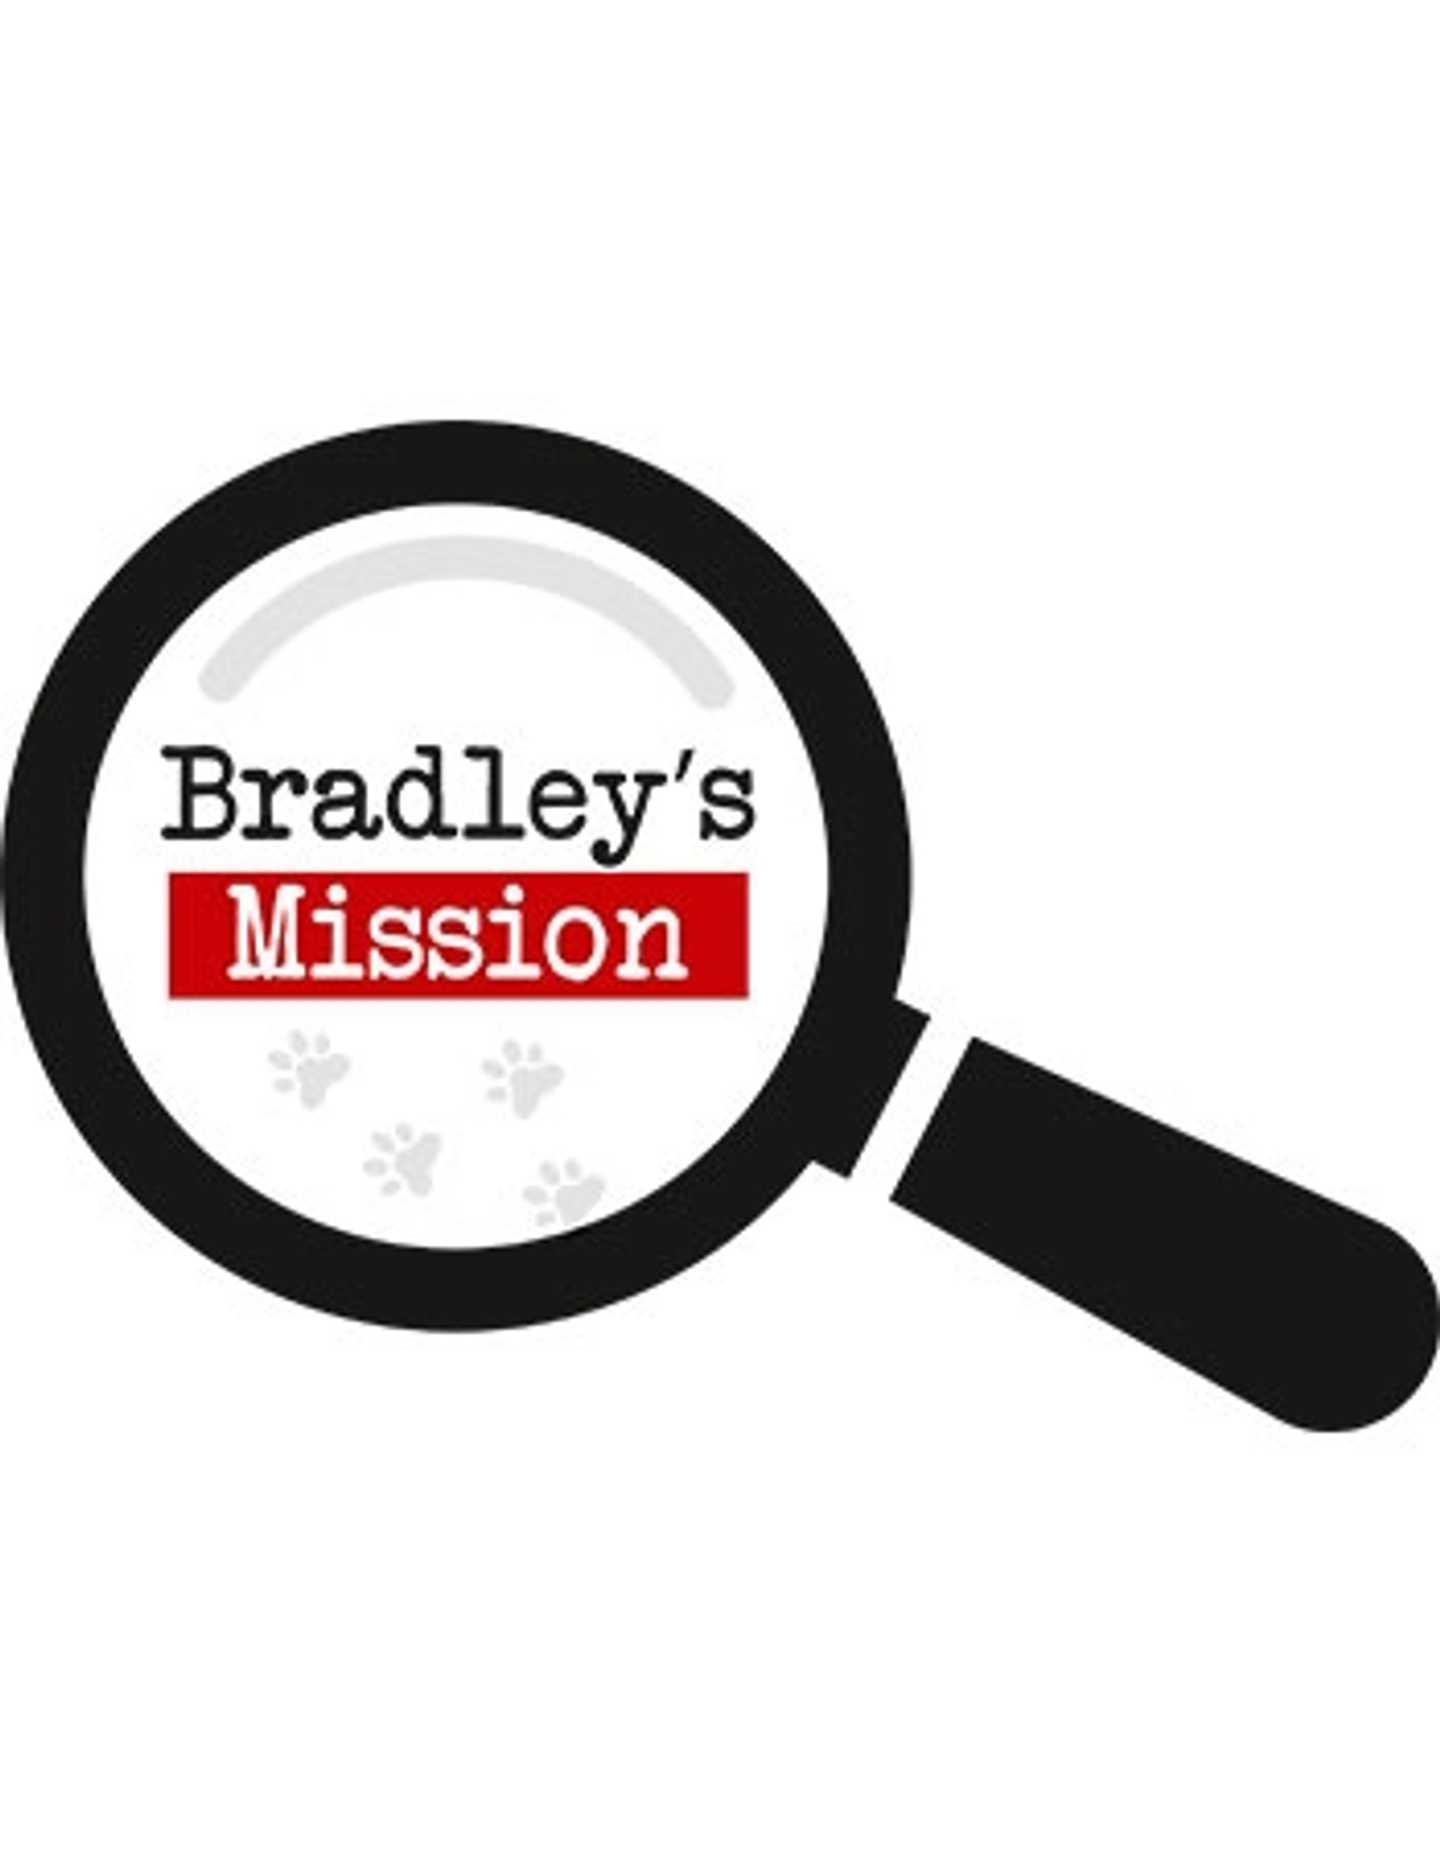 Bradley's Mission